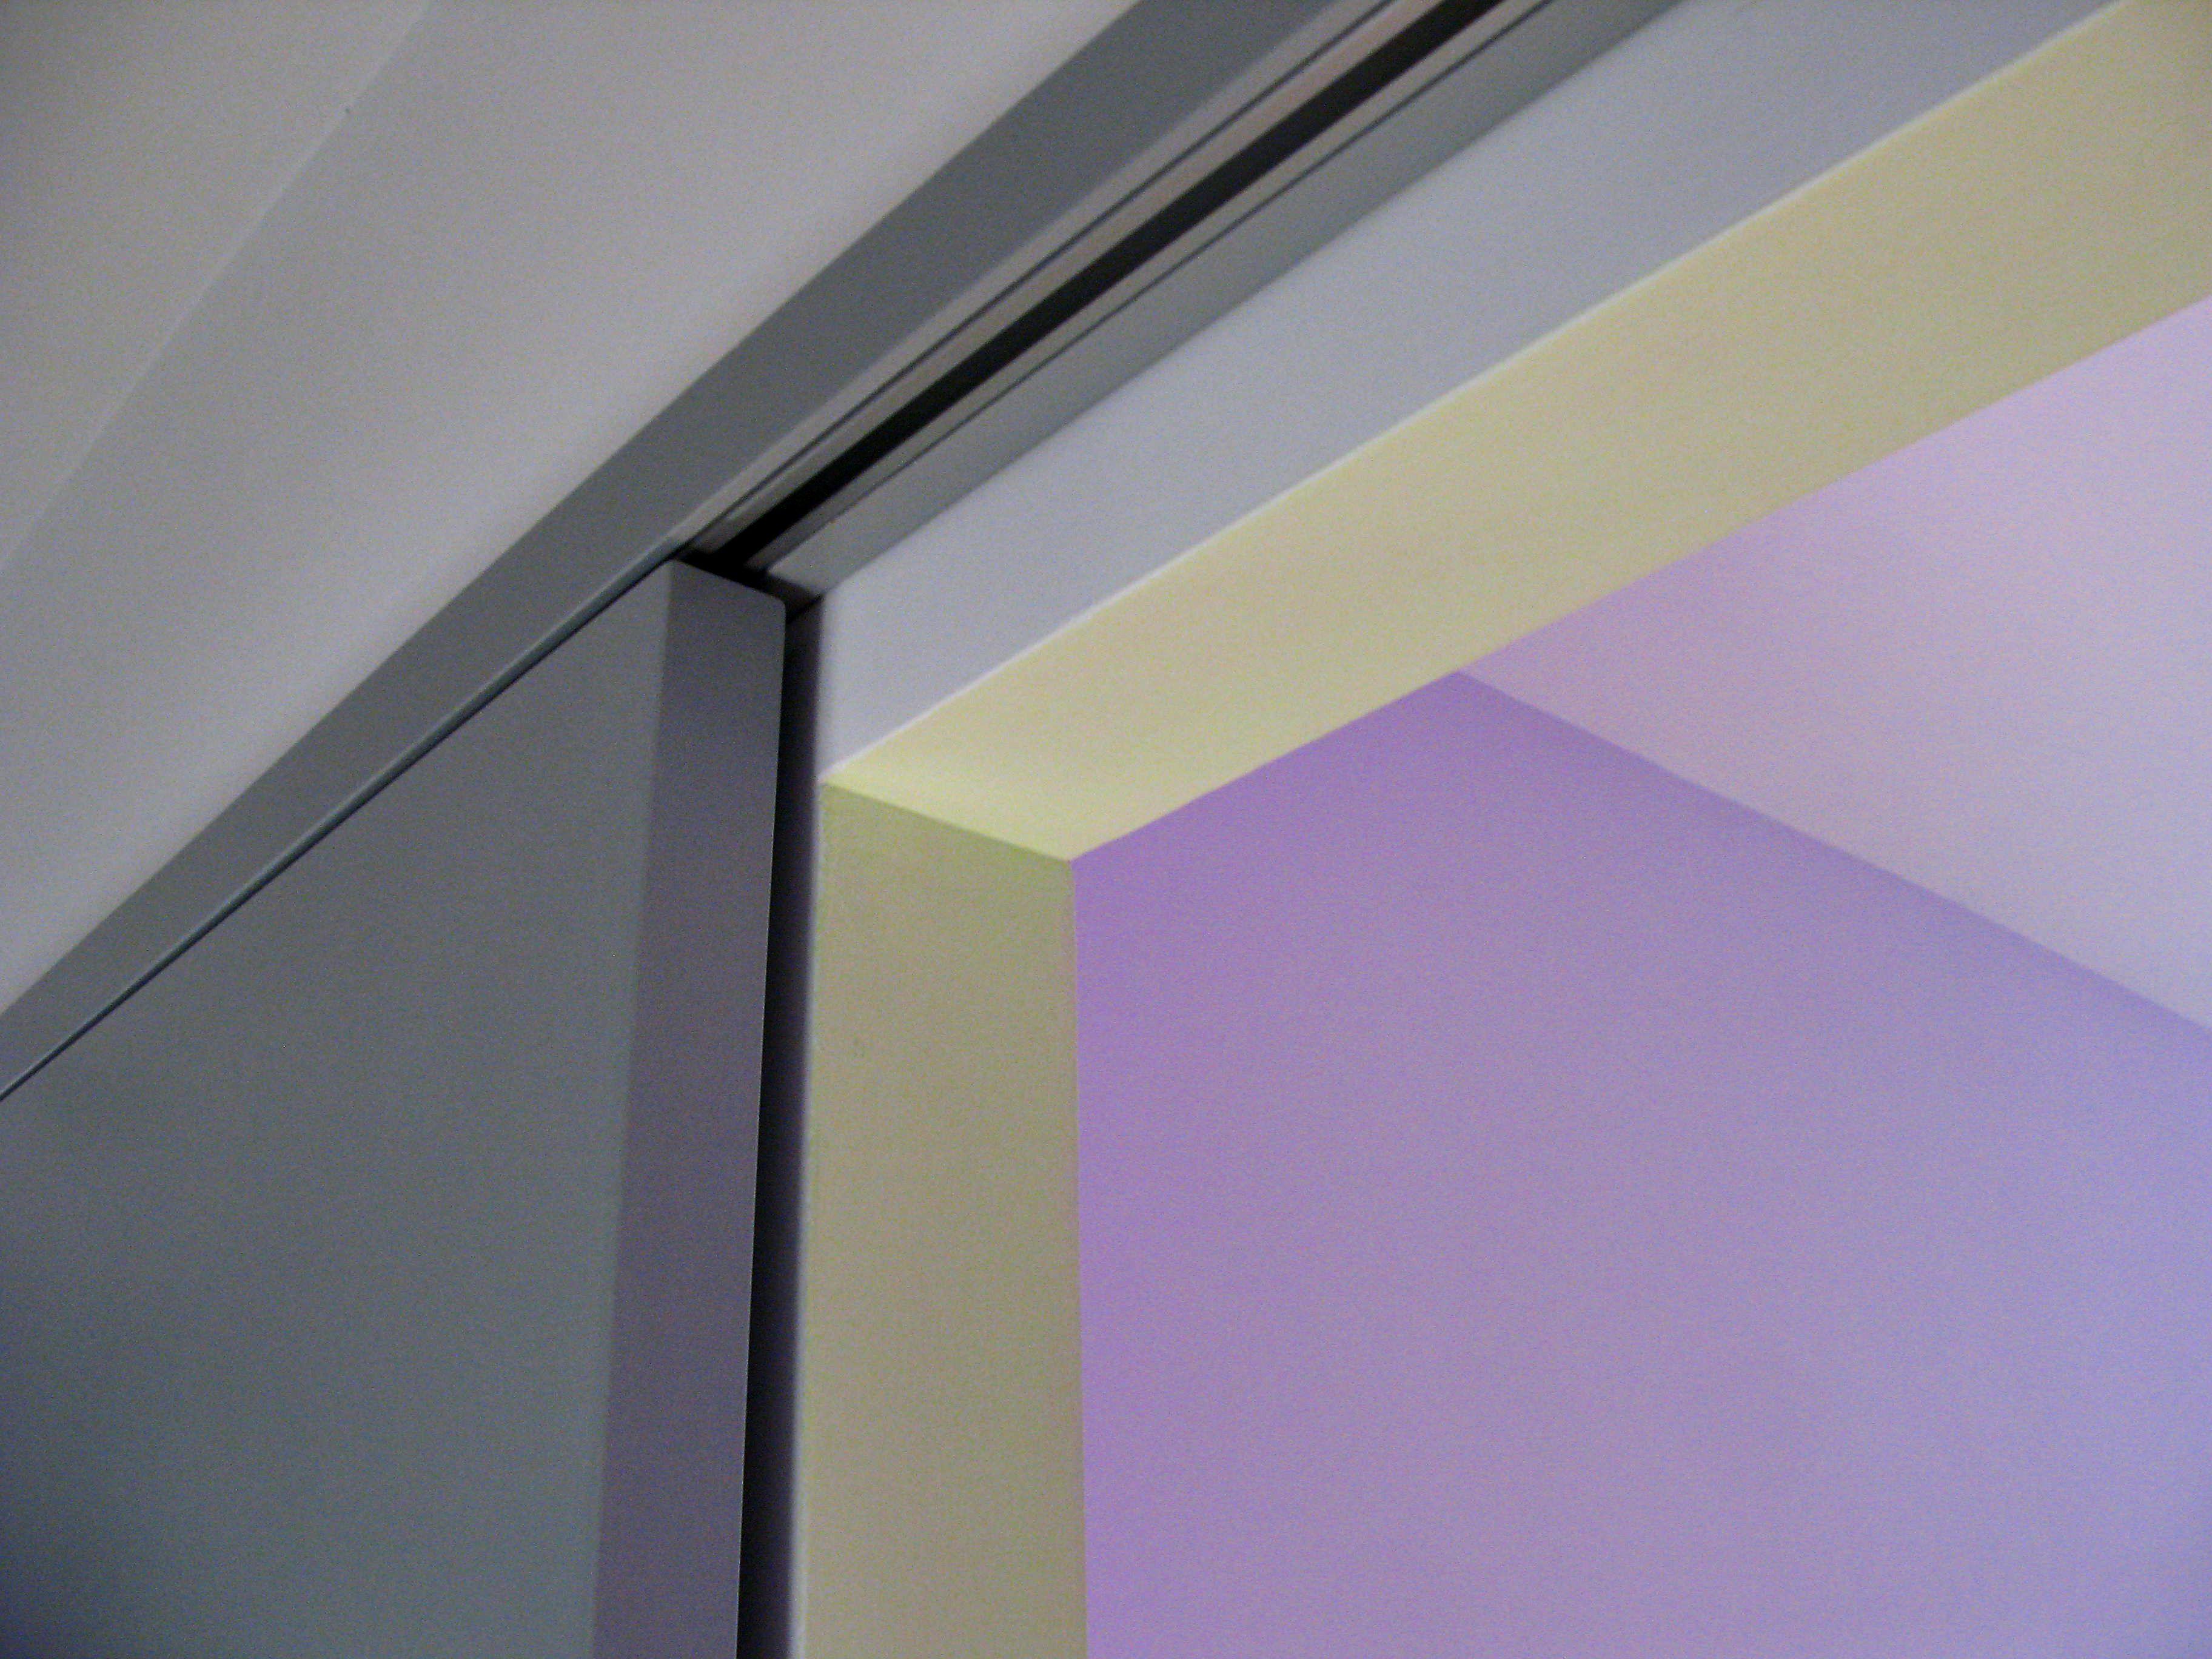 Best porta scorrevole esterna binario in polizene legno for Porta scorrevole esterna fai da te